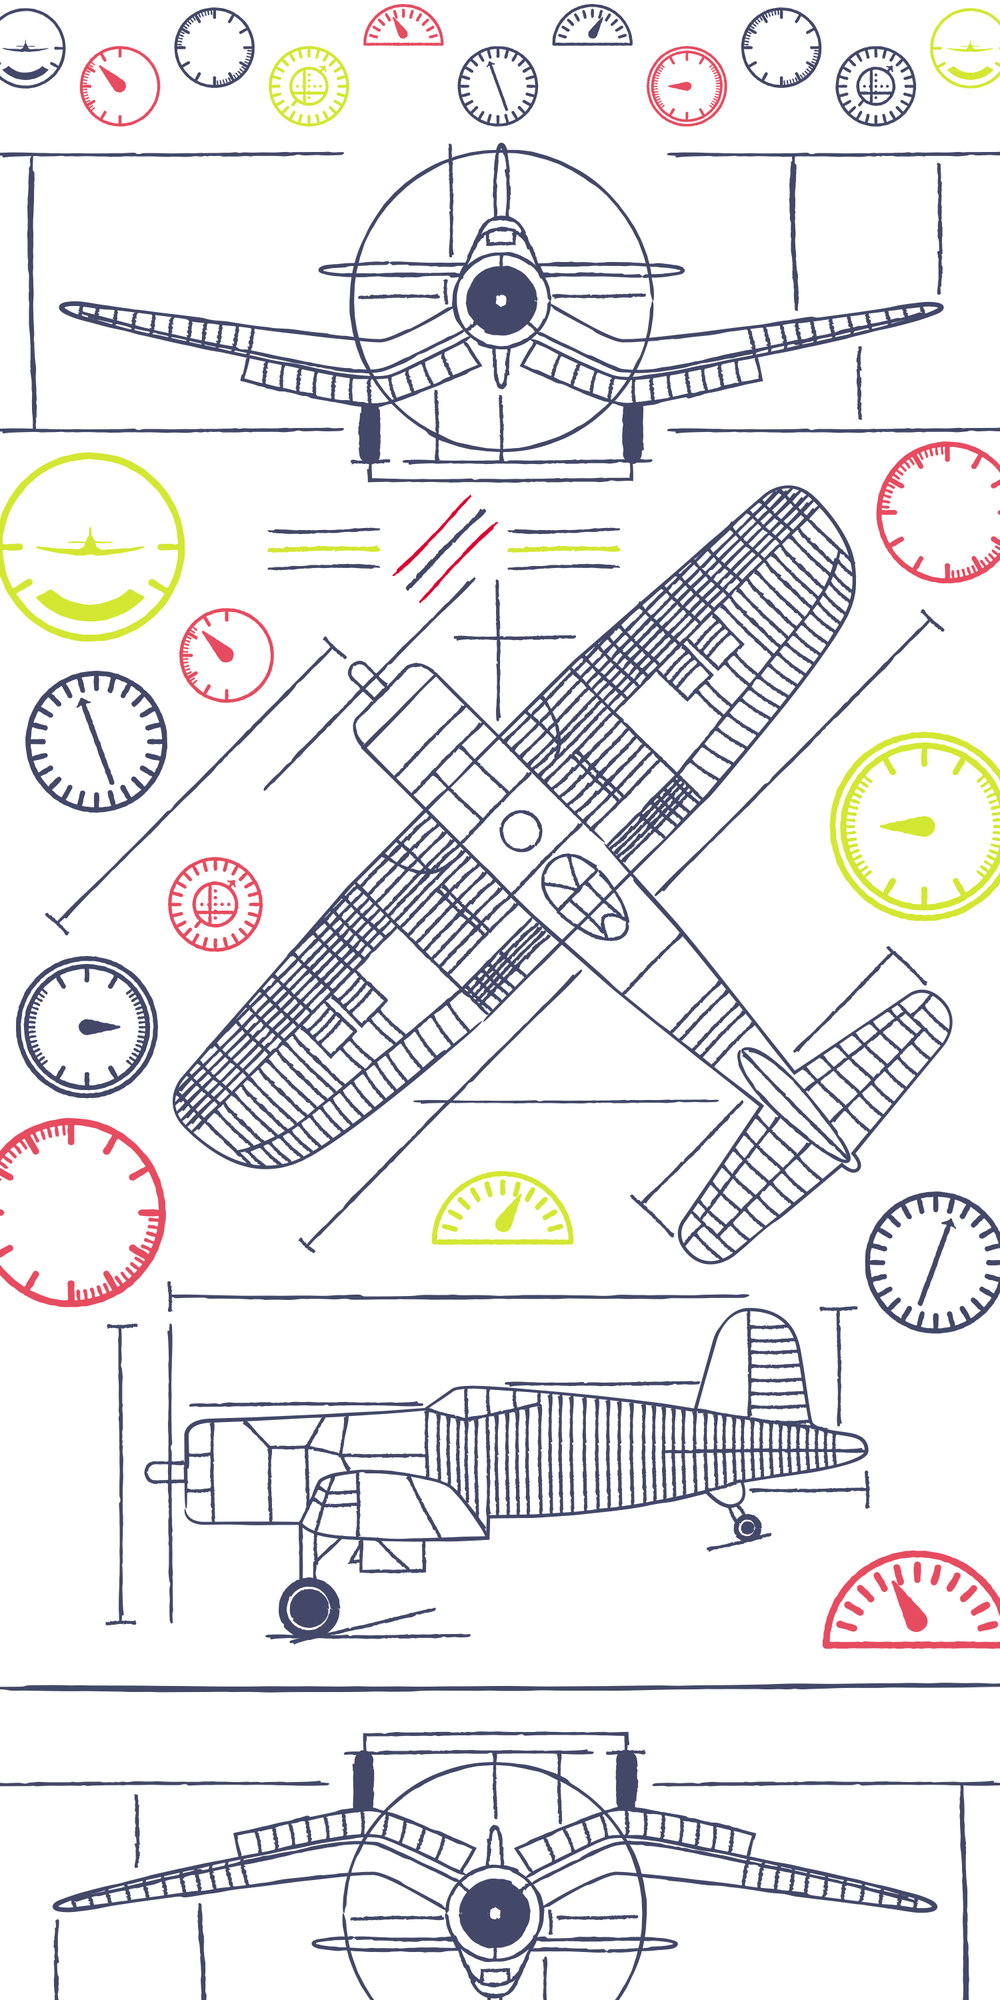 Airplanes-2T3T-M.jpg